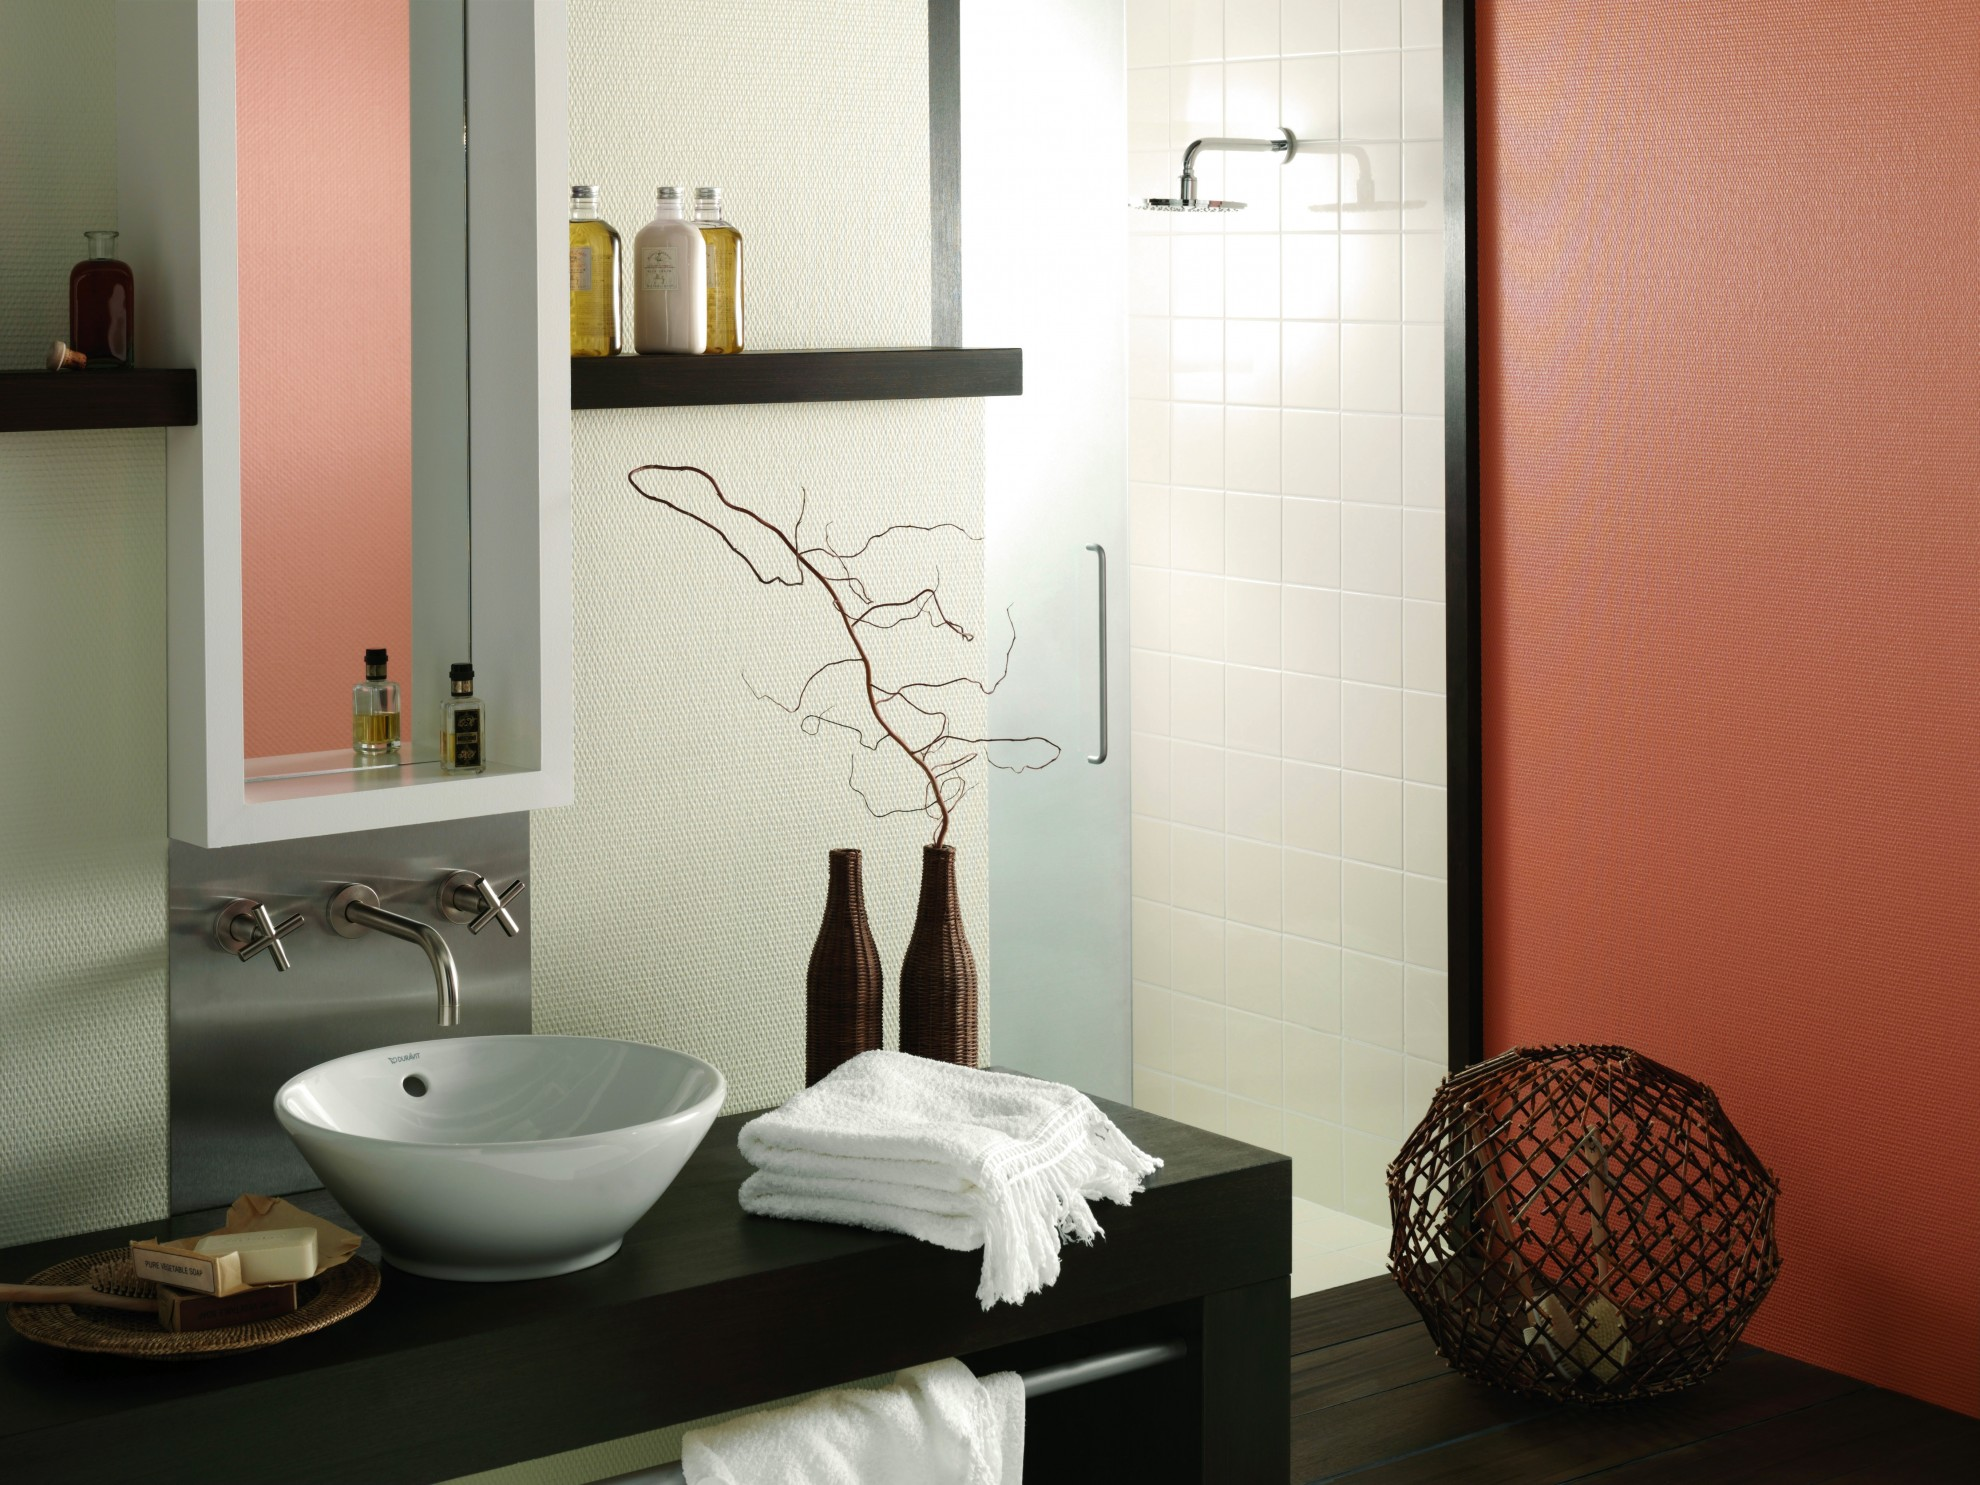 Raumgestaltung, Wand, Innenraum, Tapete, Putz, Badezimmer